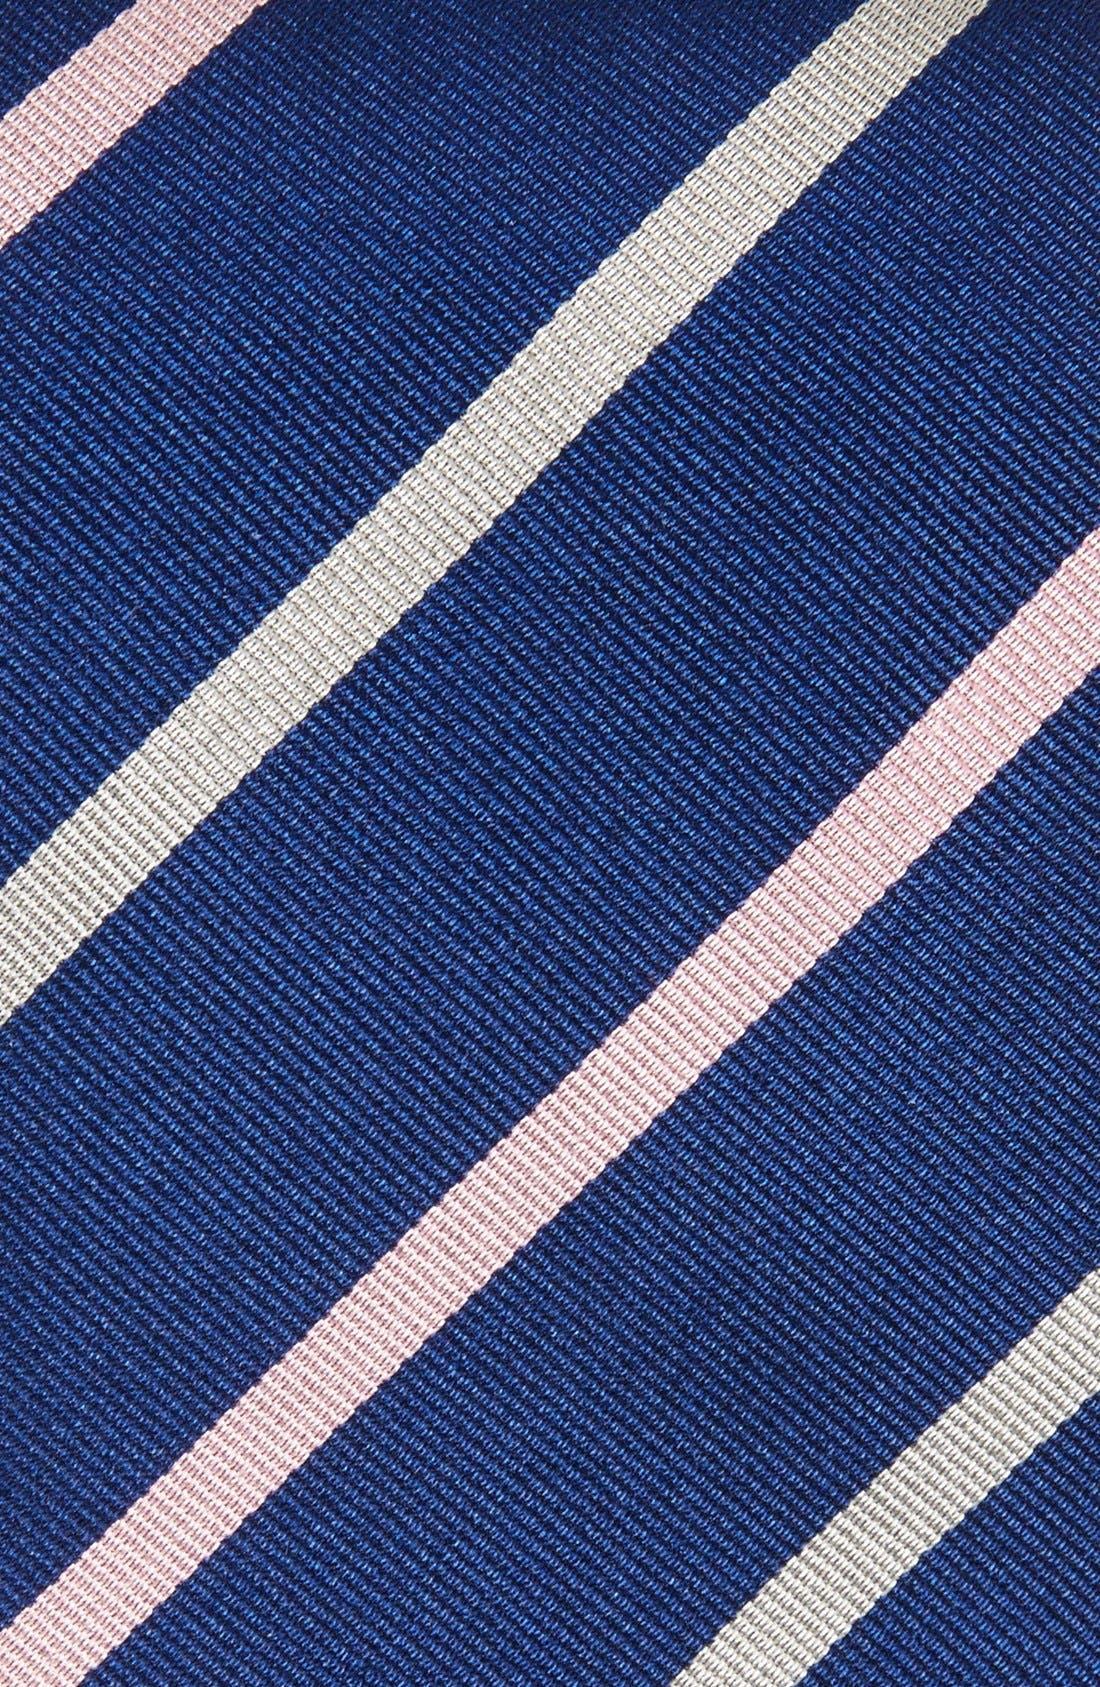 Stripe Silk Tie,                             Alternate thumbnail 2, color,                             NAVY